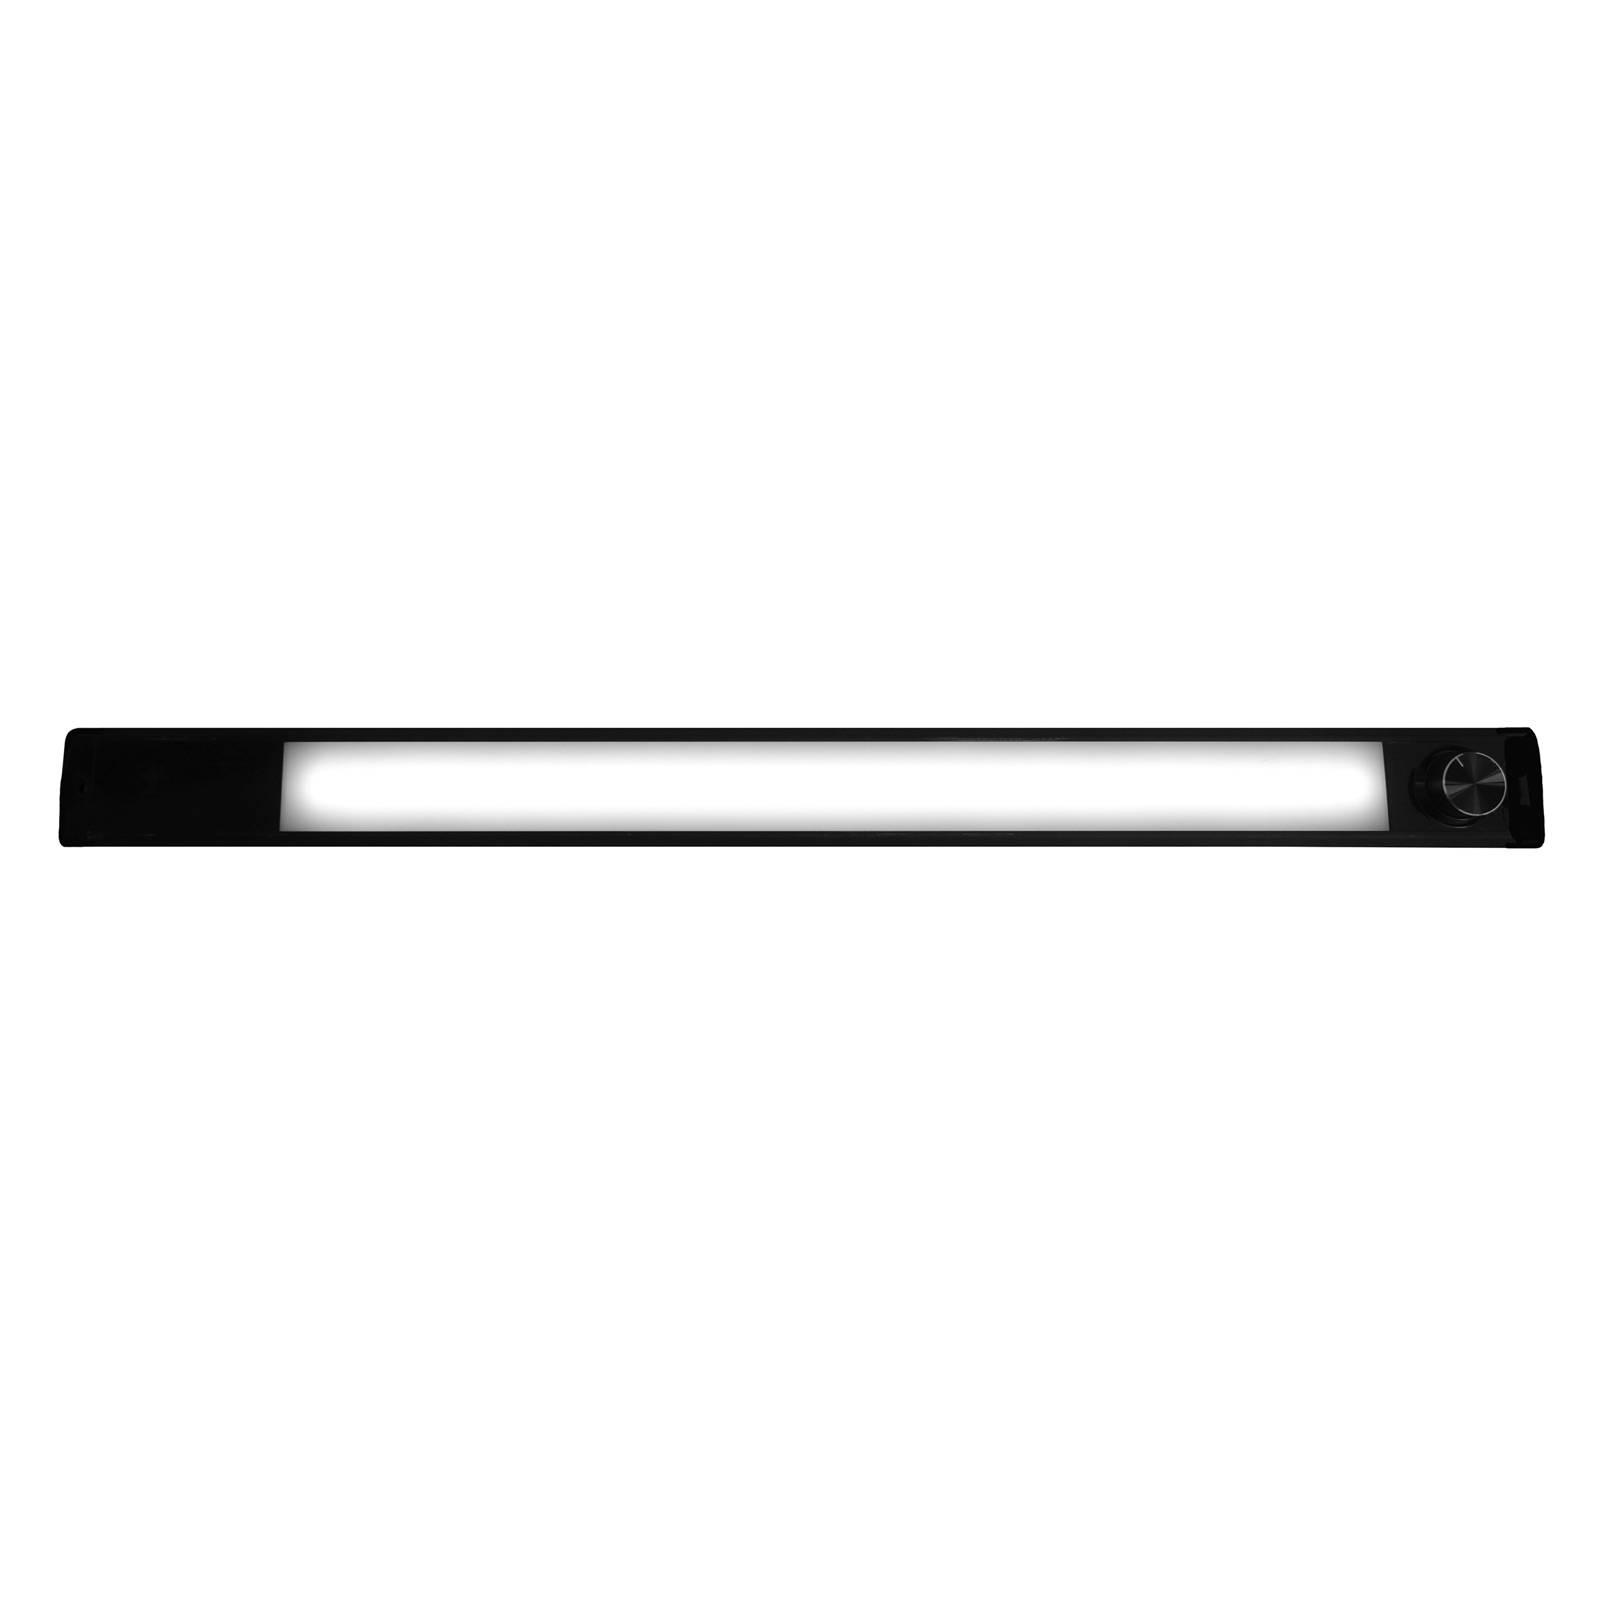 Lampada LED da mobili Calina 60 Switch Tone, nera